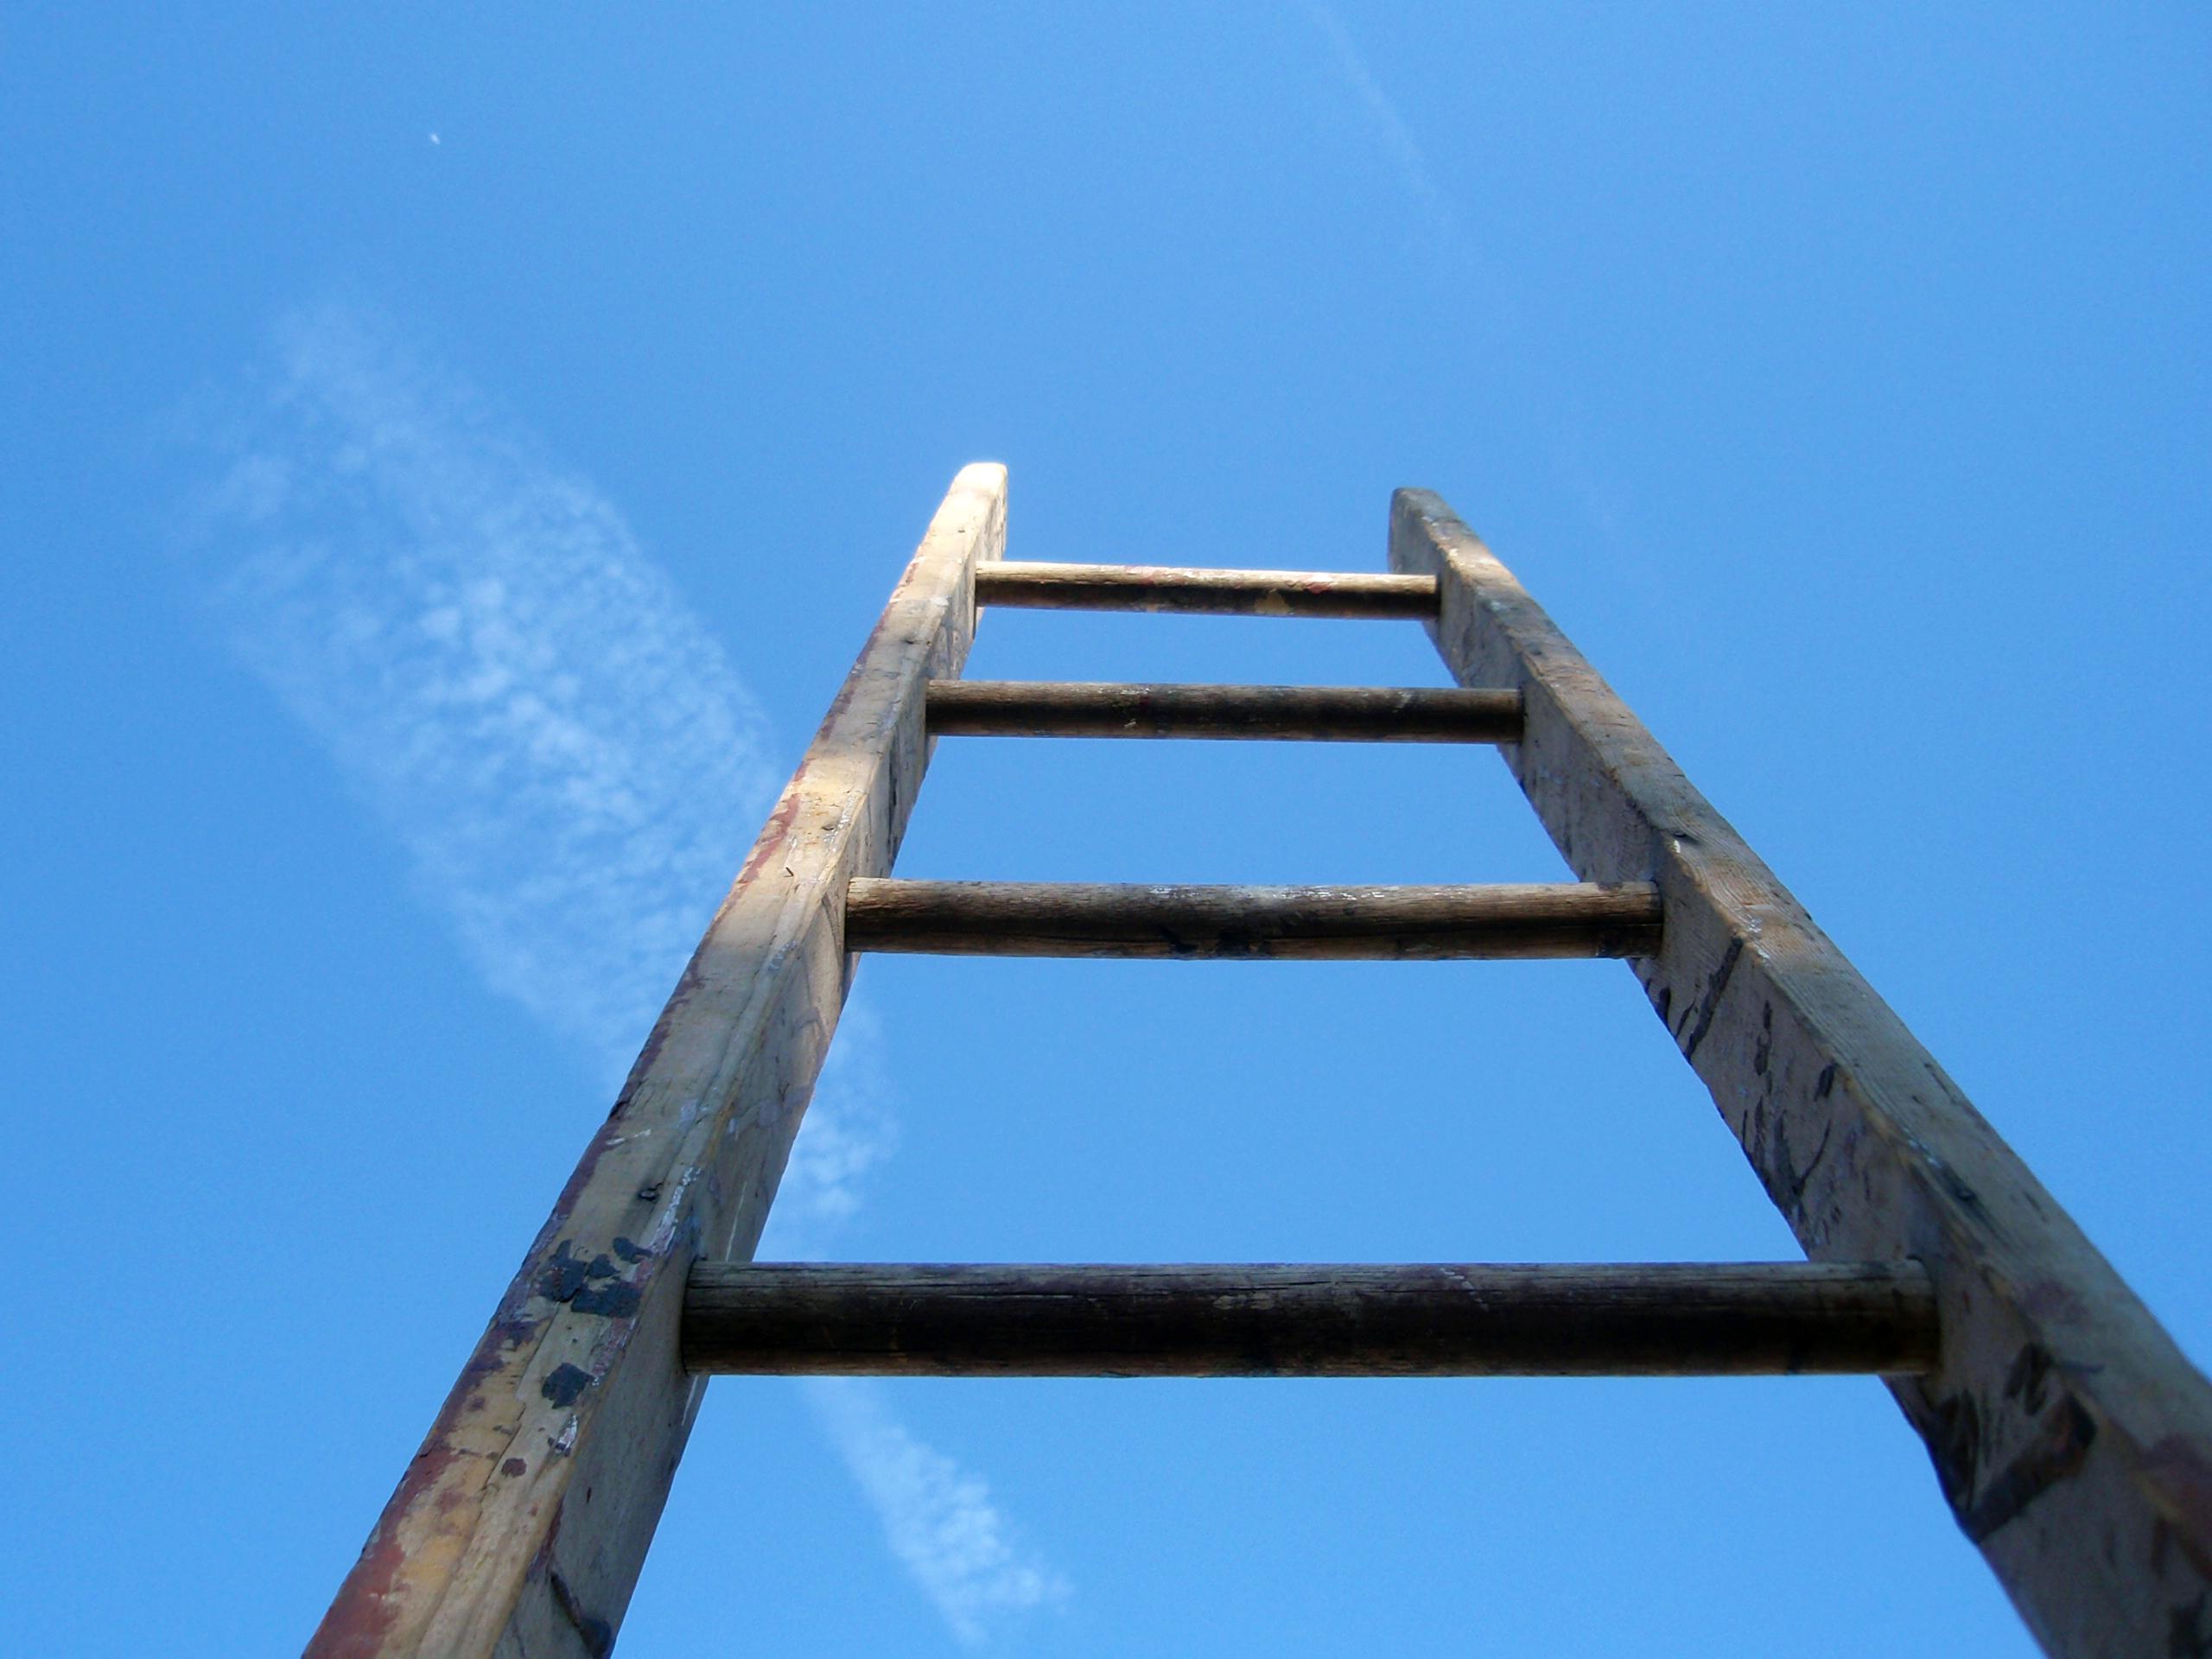 The_ladder_of_life_is_full_of_splinters.jpg